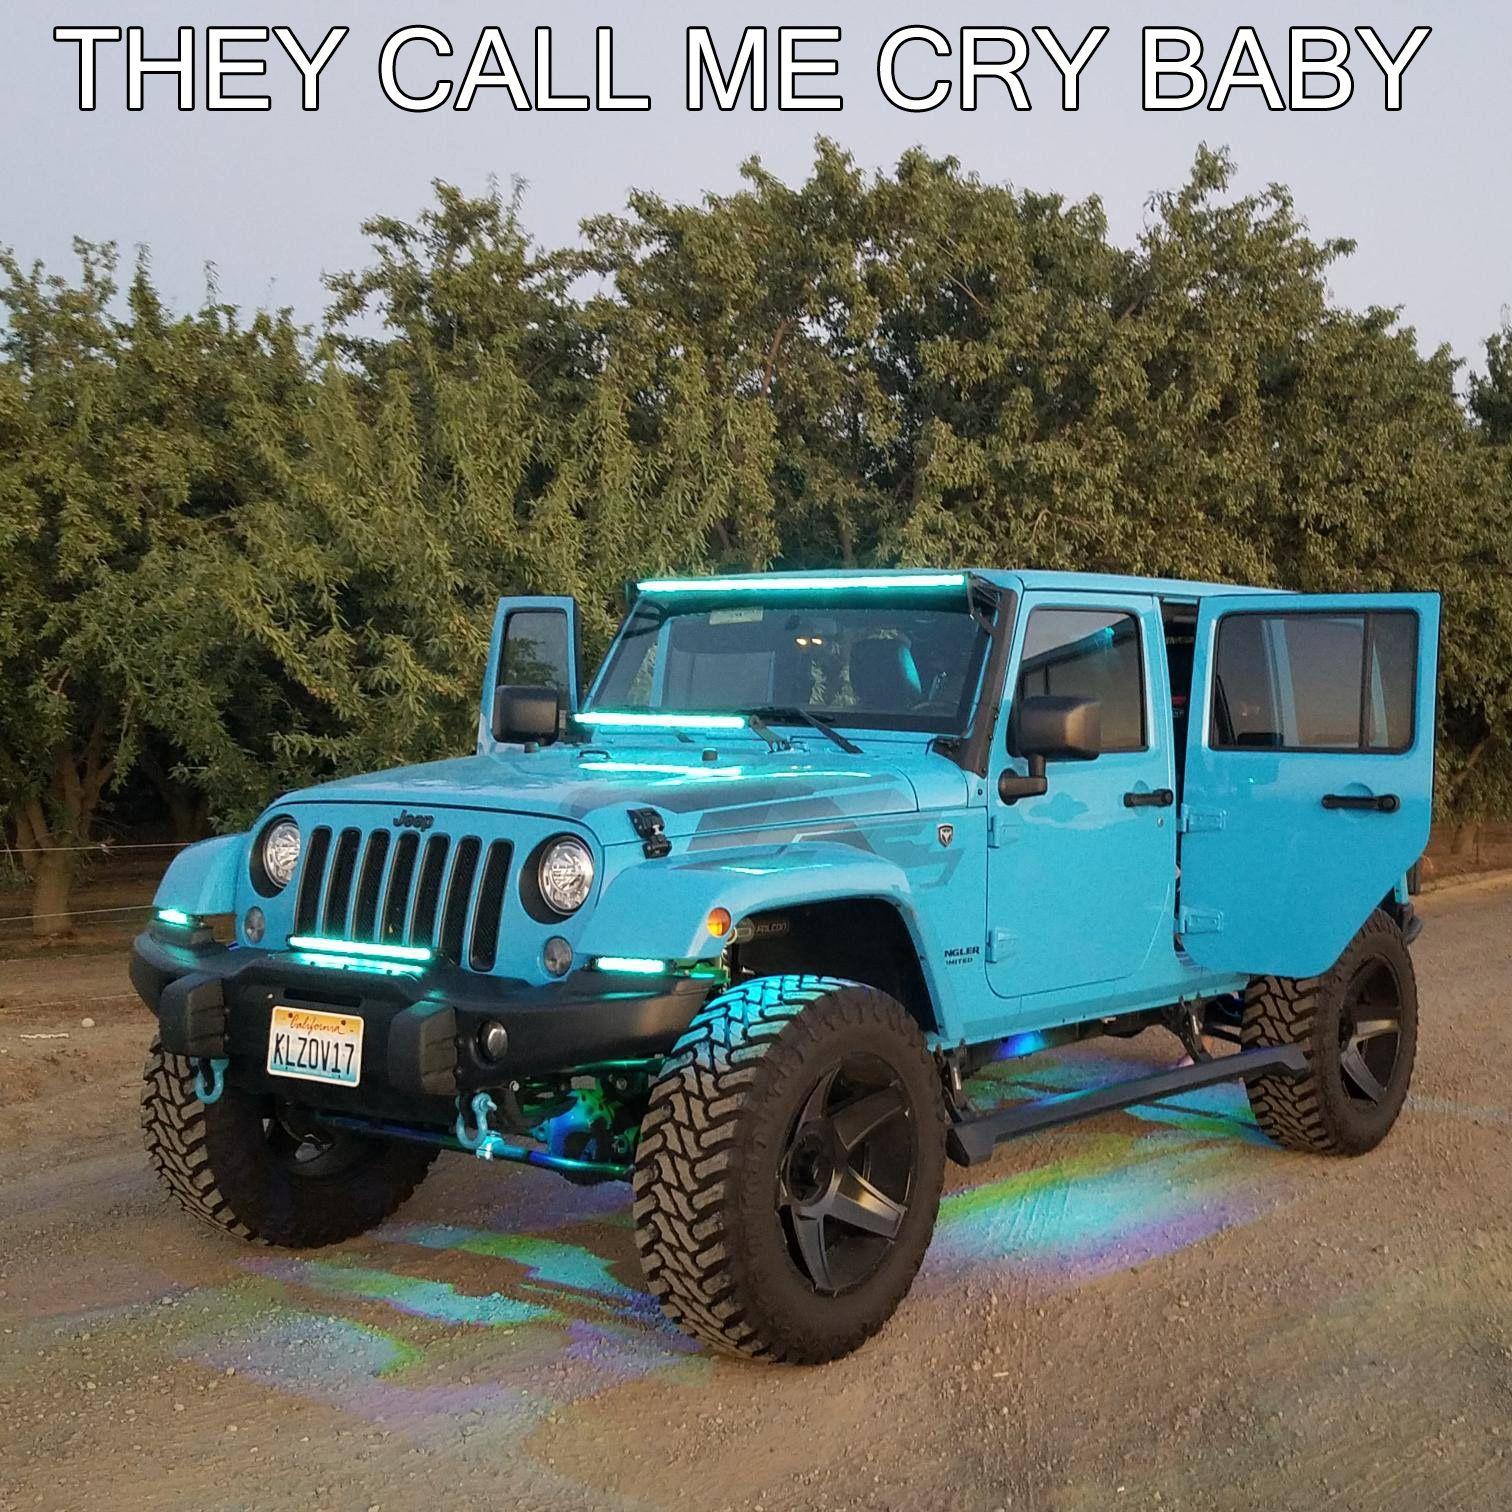 Baby Blue Jeep Jeepwrangler Blue Jeep Jeep Baby Blue Jeep